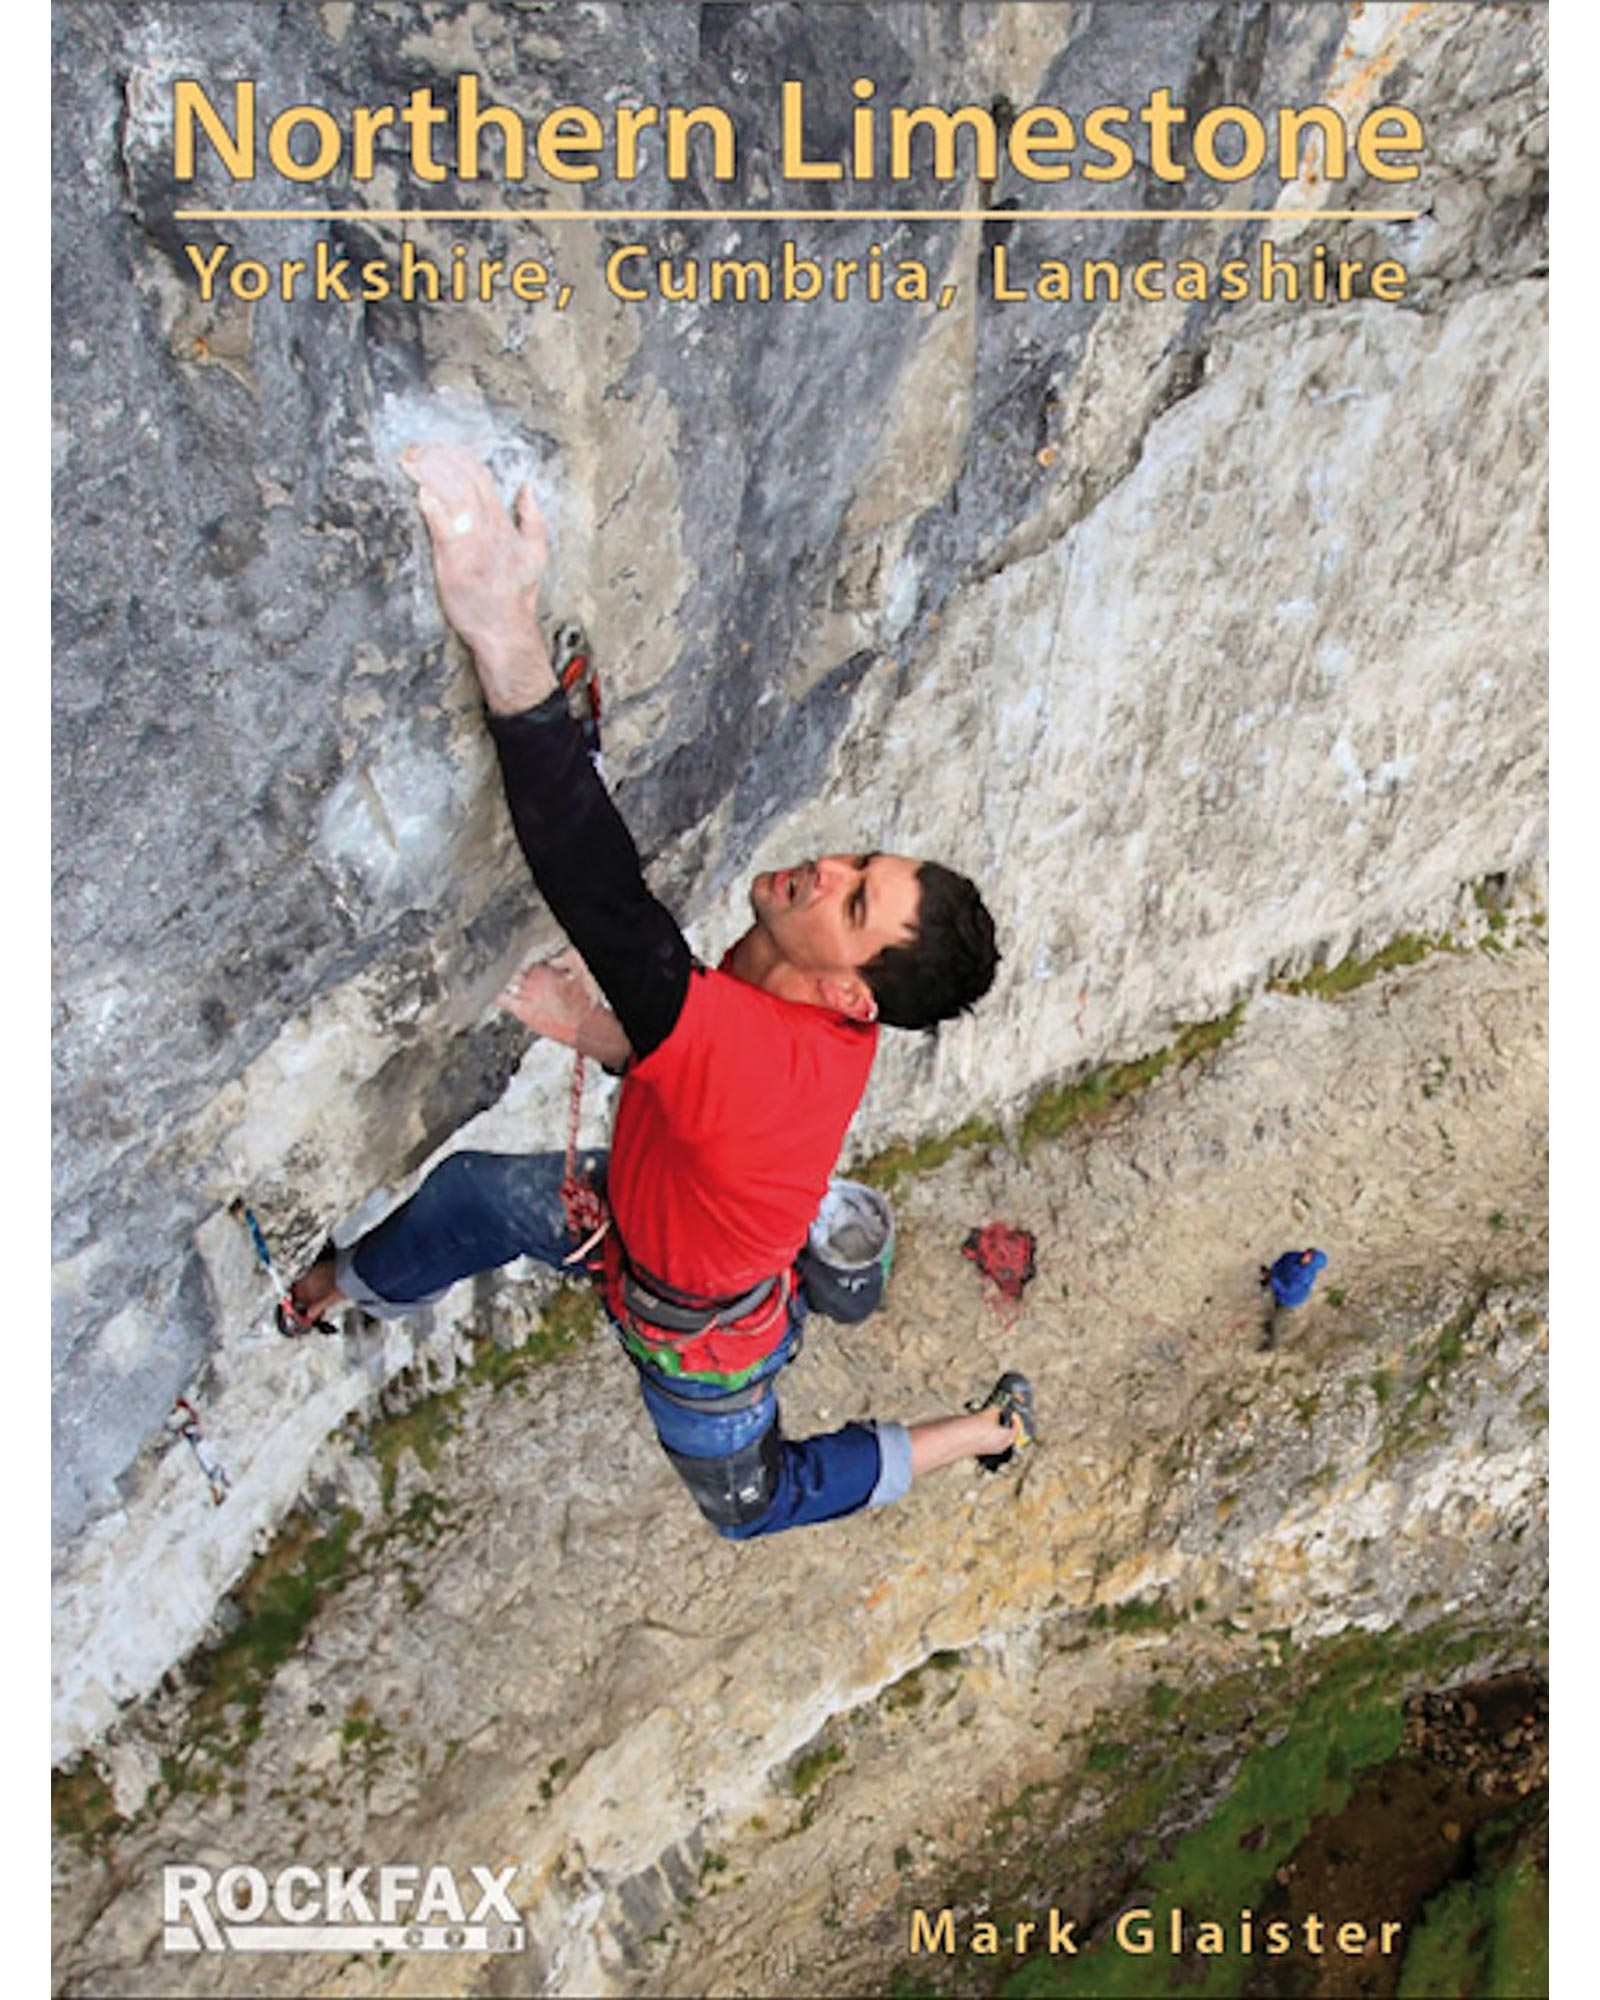 Rockfax Lakes Bouldering Rfax Guide Book